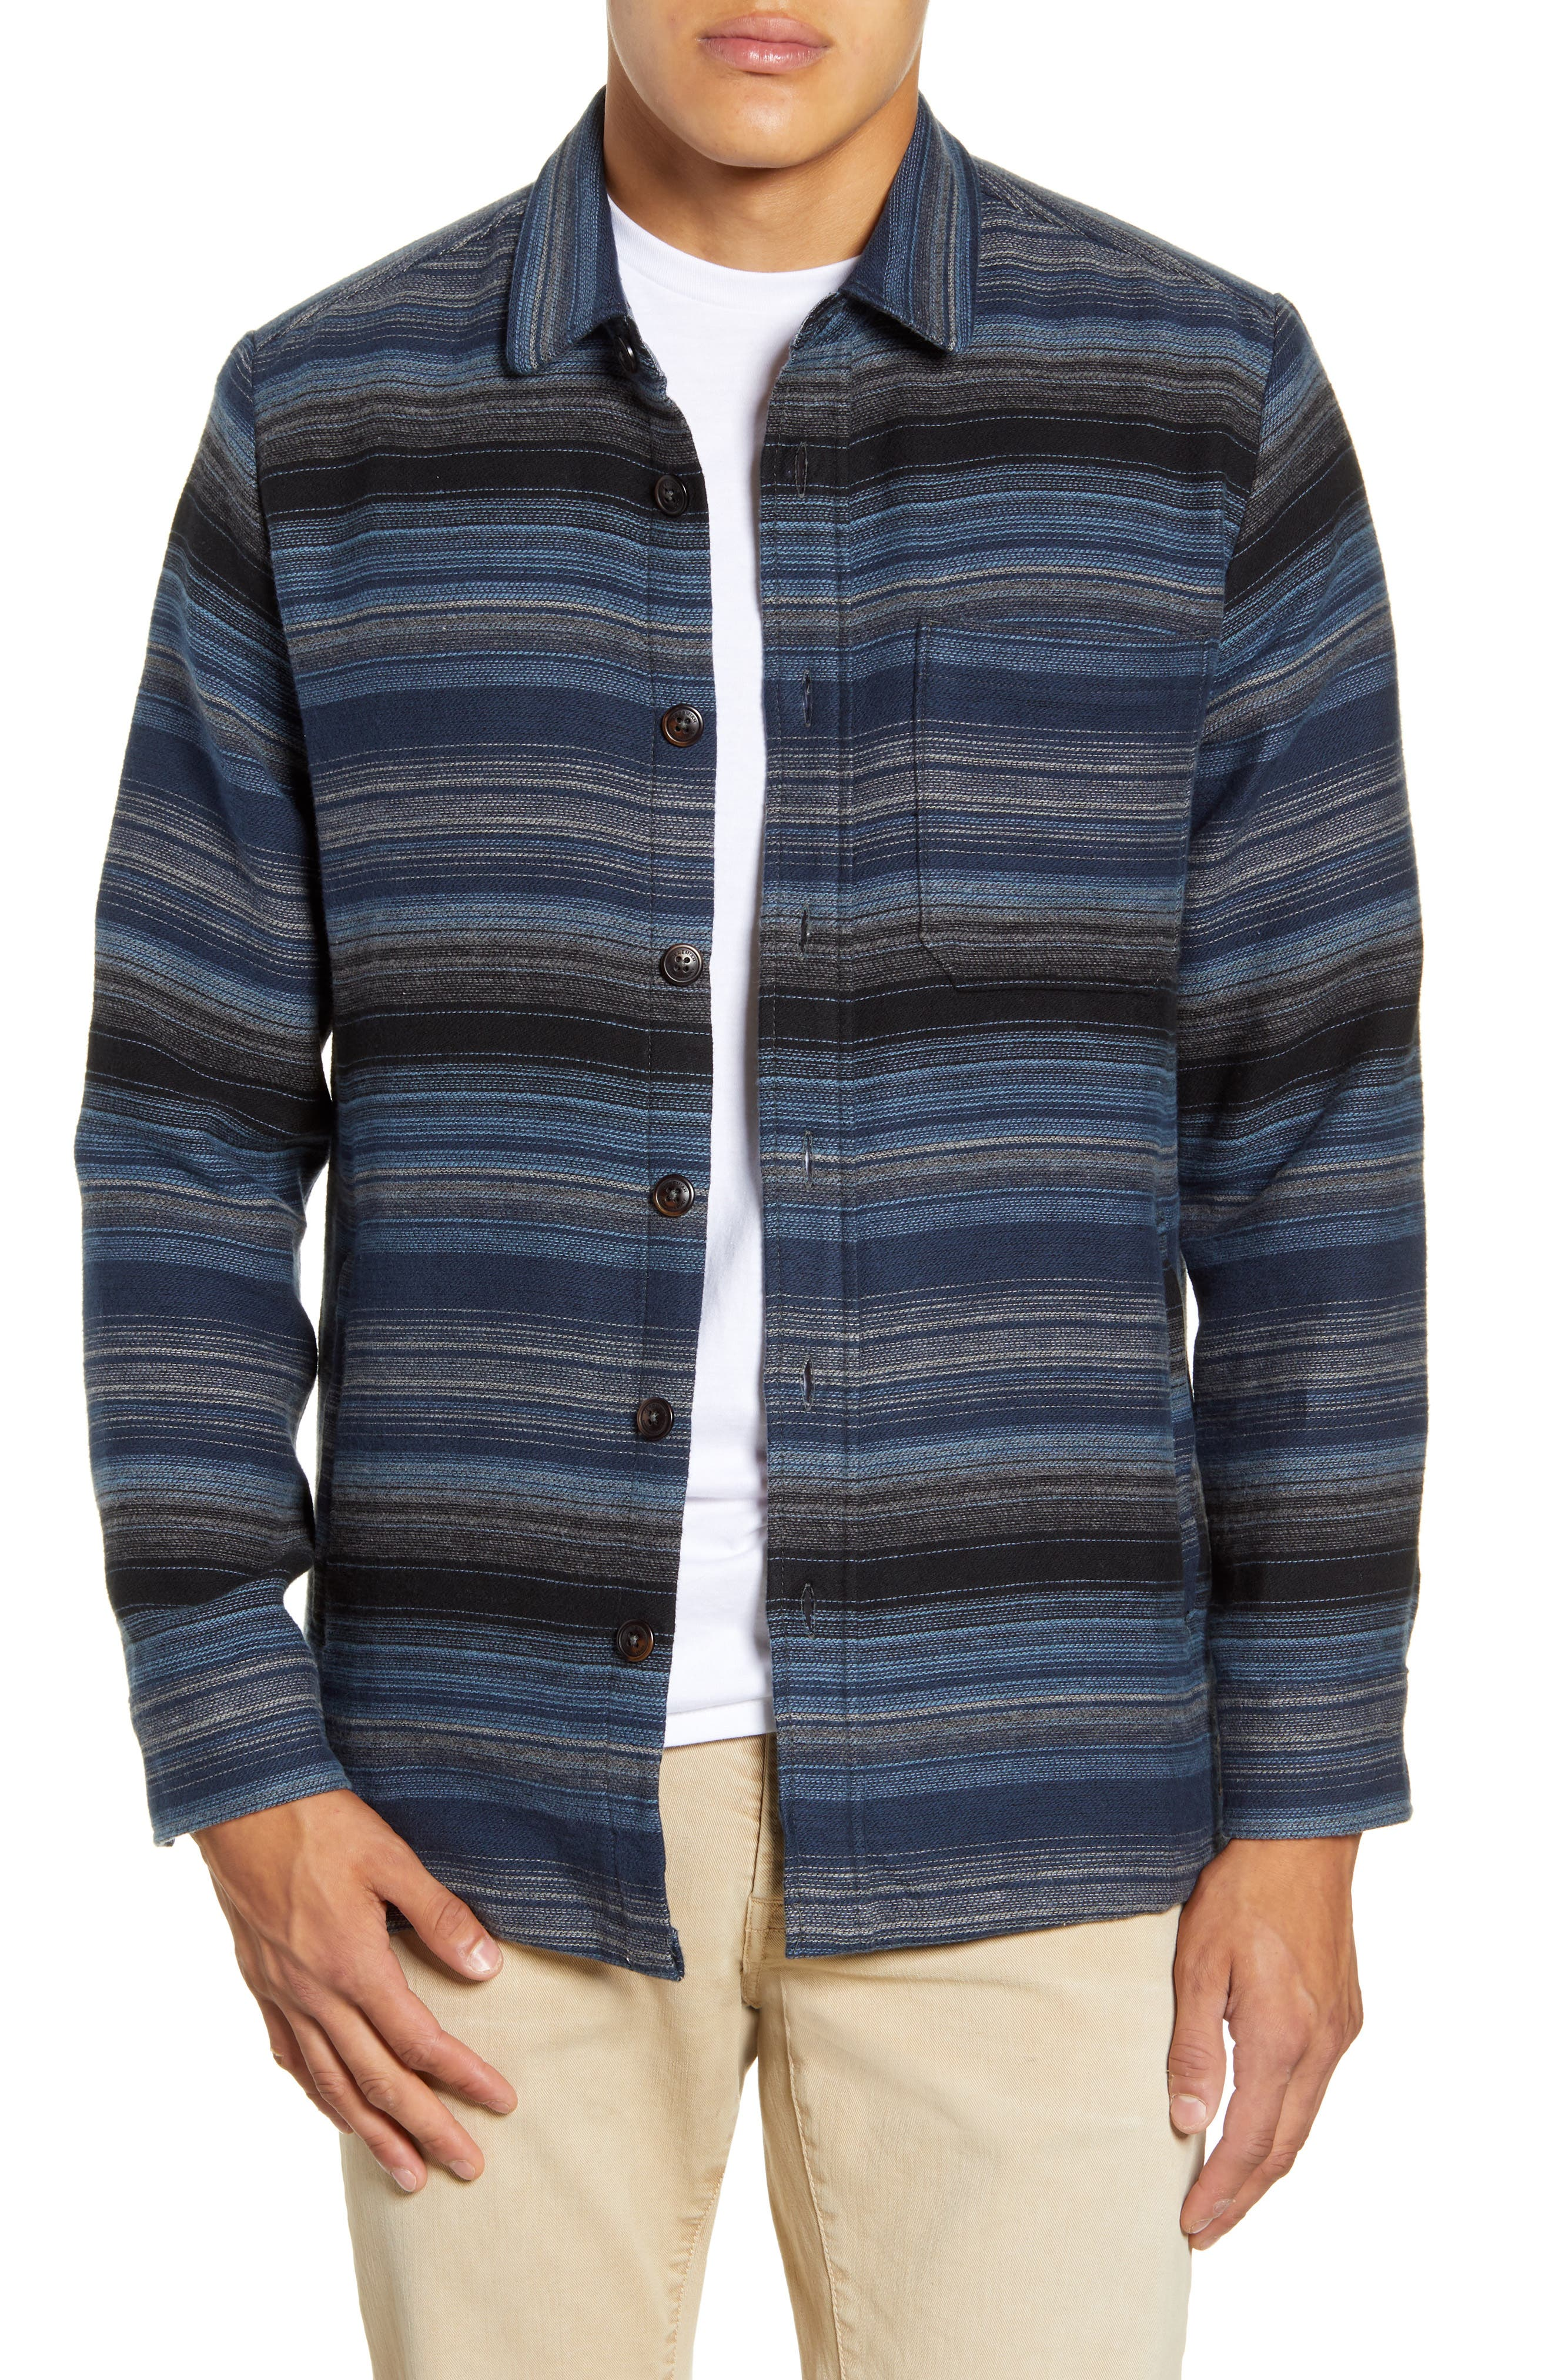 Fanning Stripe Button-Up Shirt Jacket